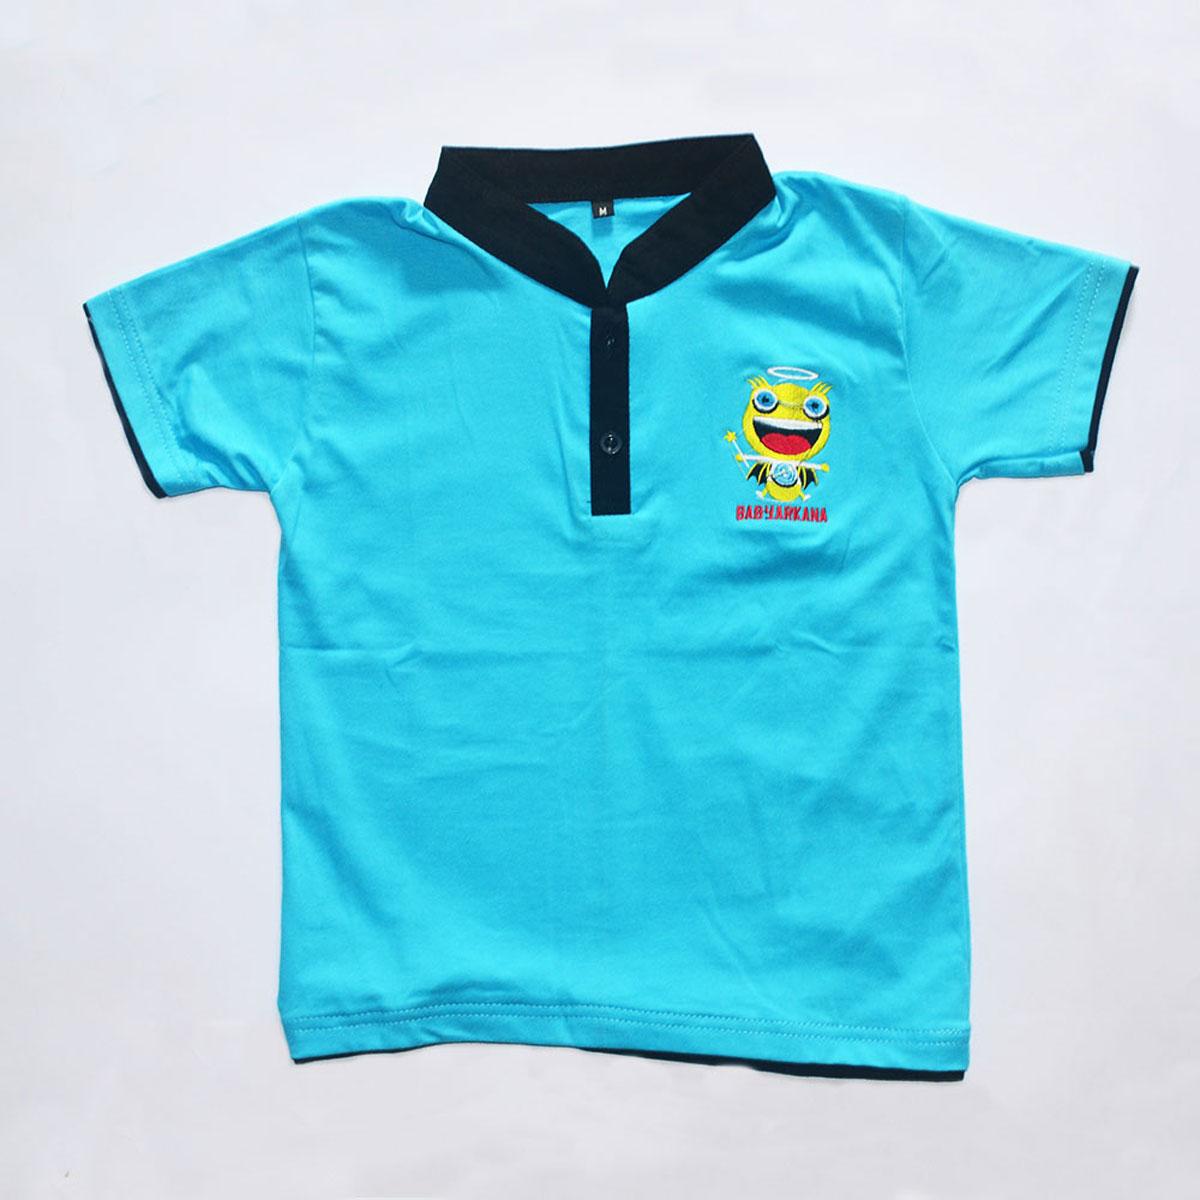 supplier baju di Denpasar